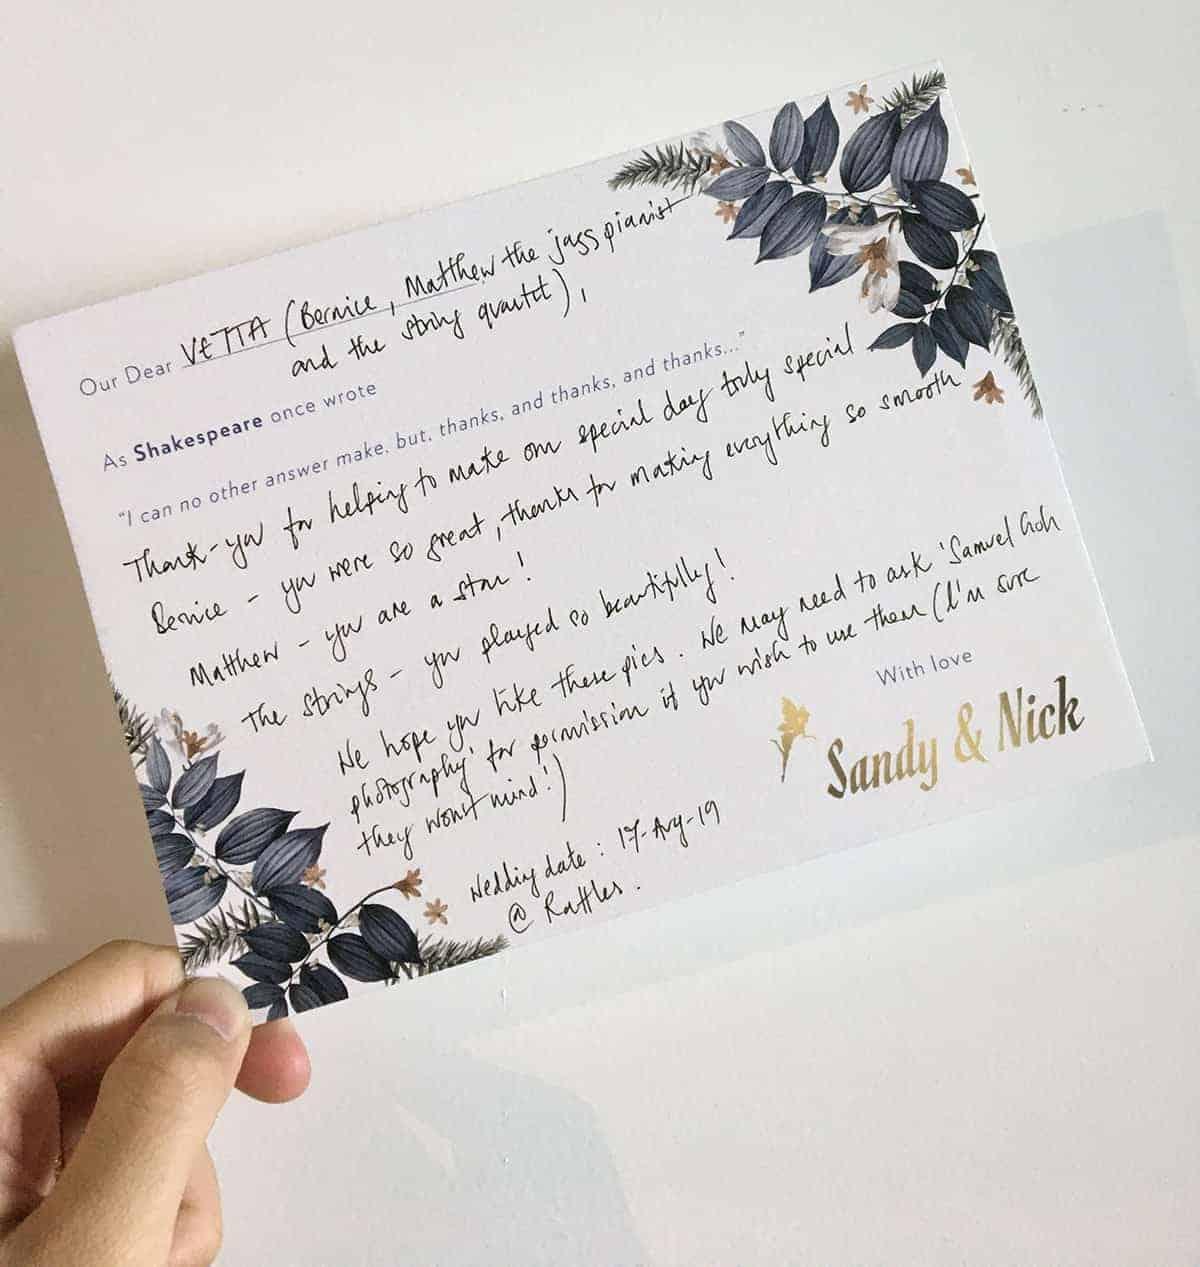 Testimonial from Sandy